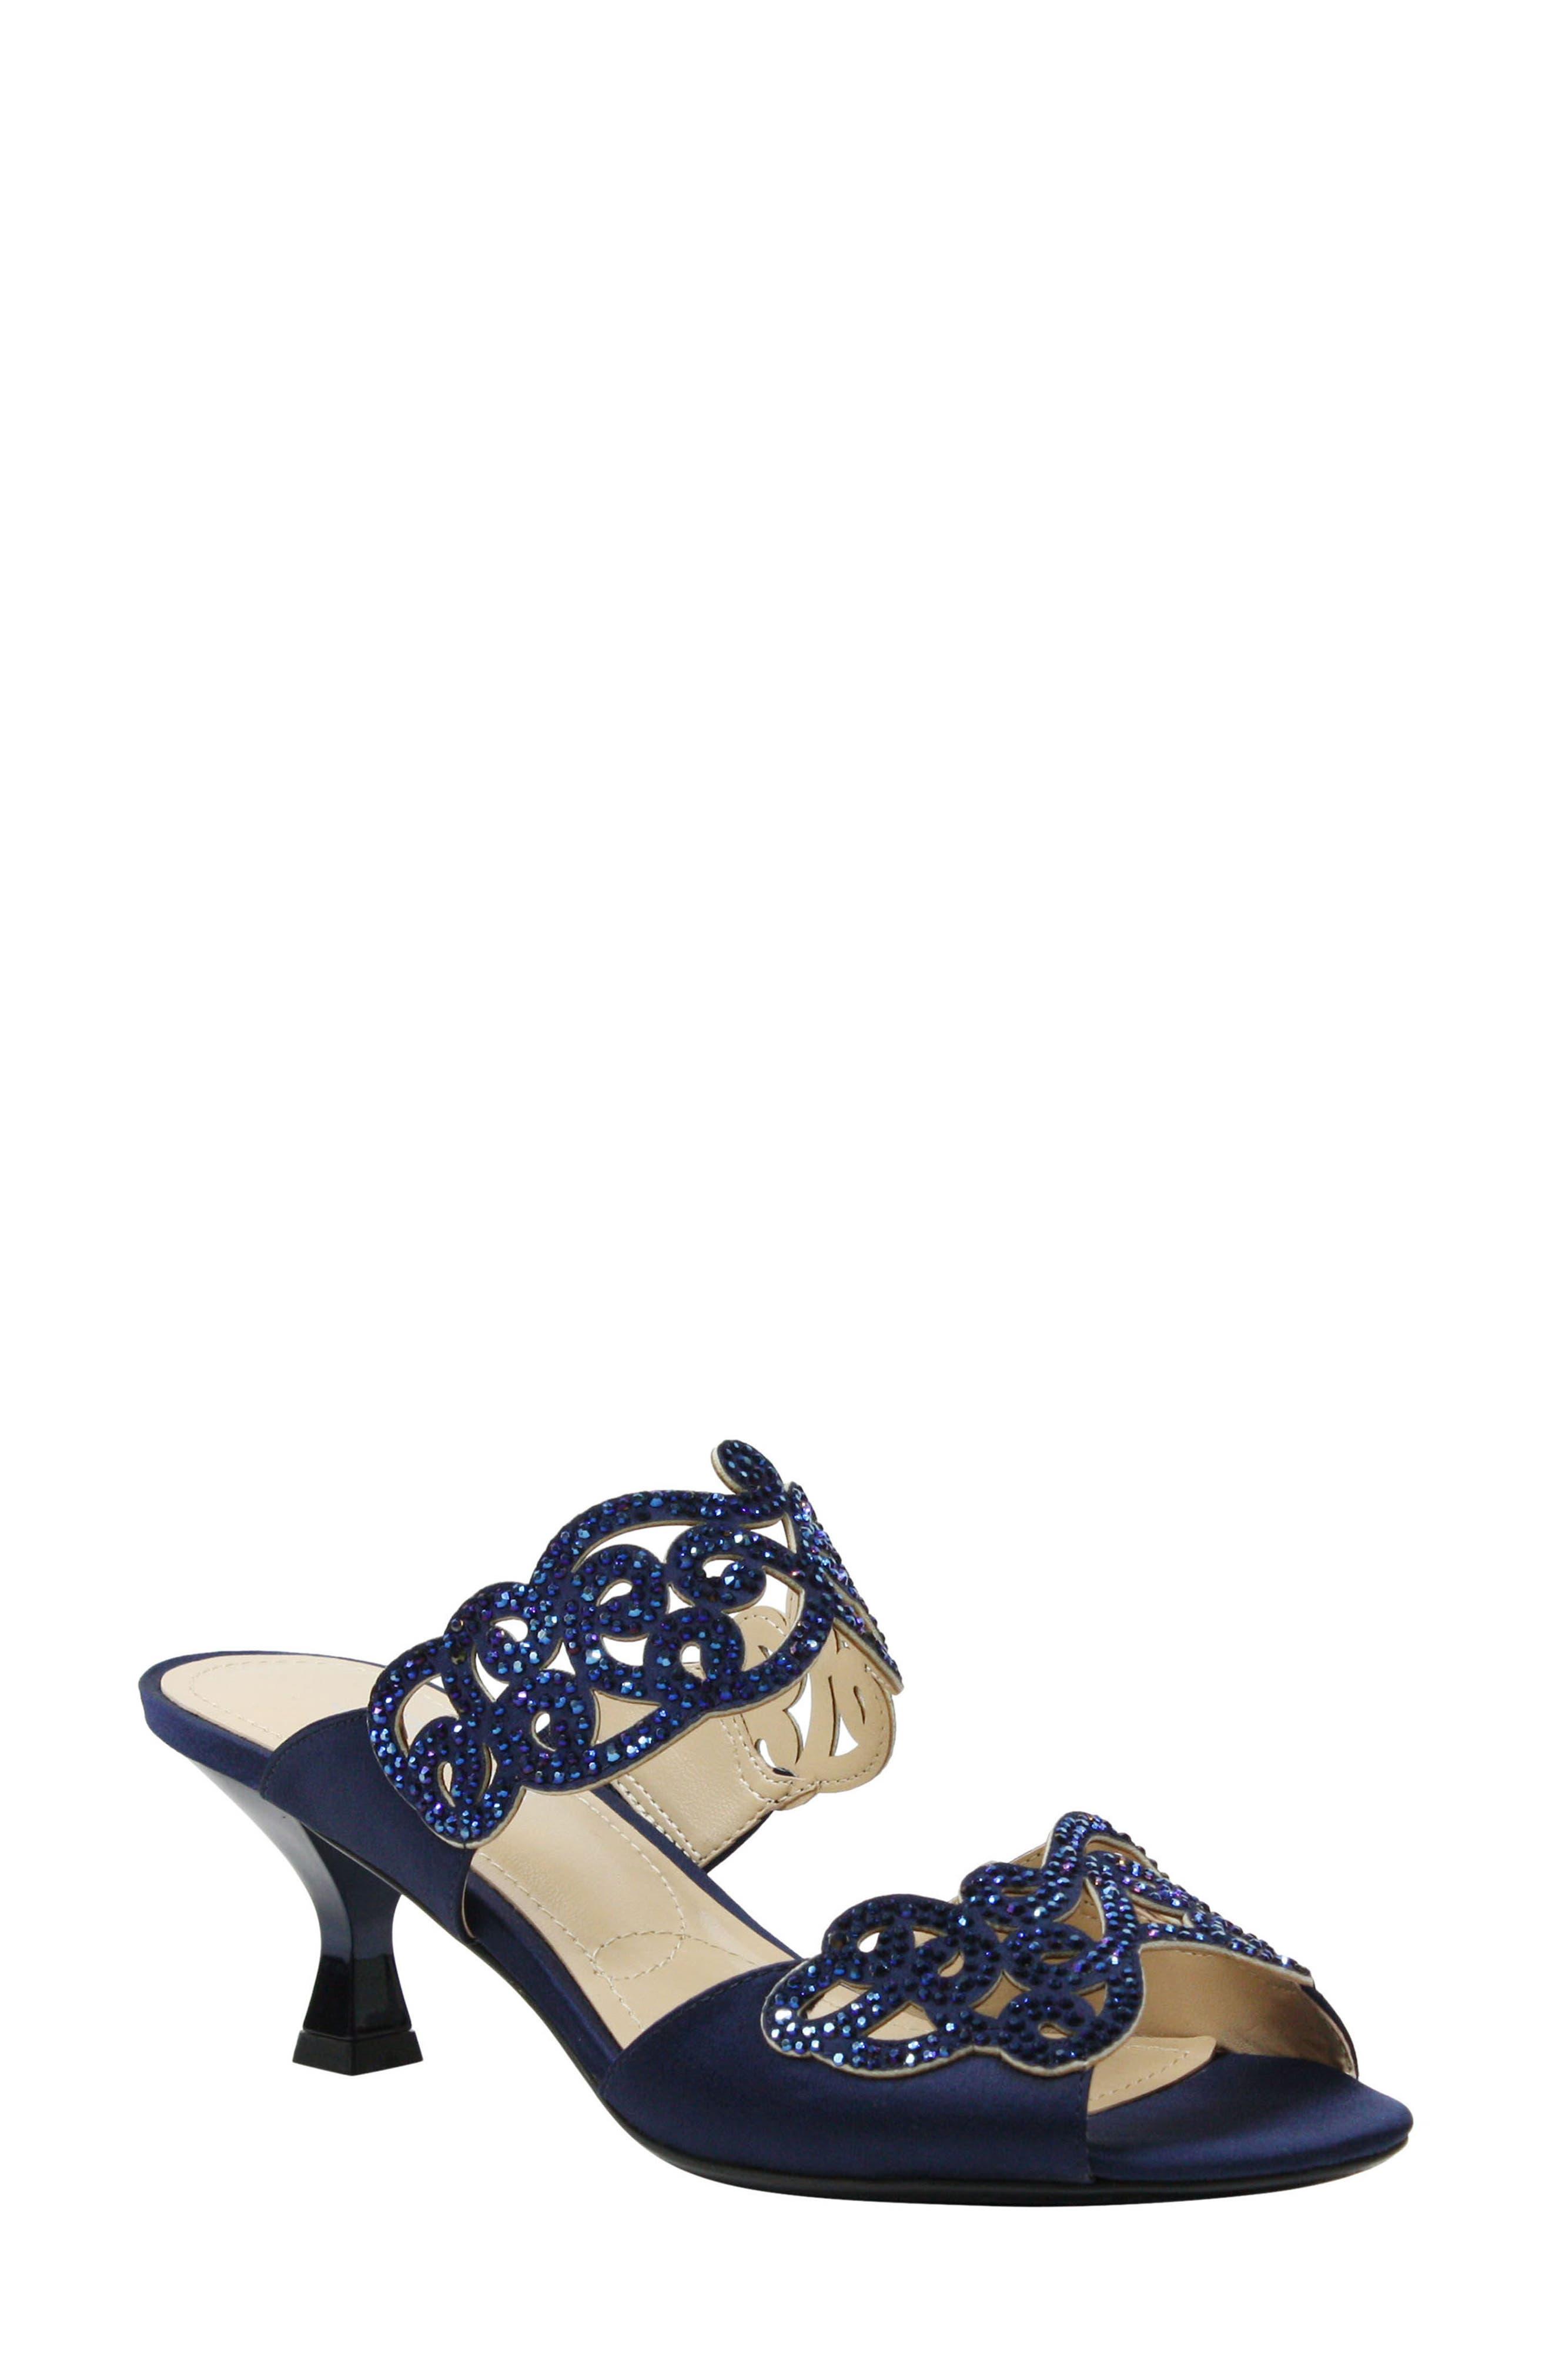 'Francie' Evening Sandal,                         Main,                         color, NAVY FABRIC